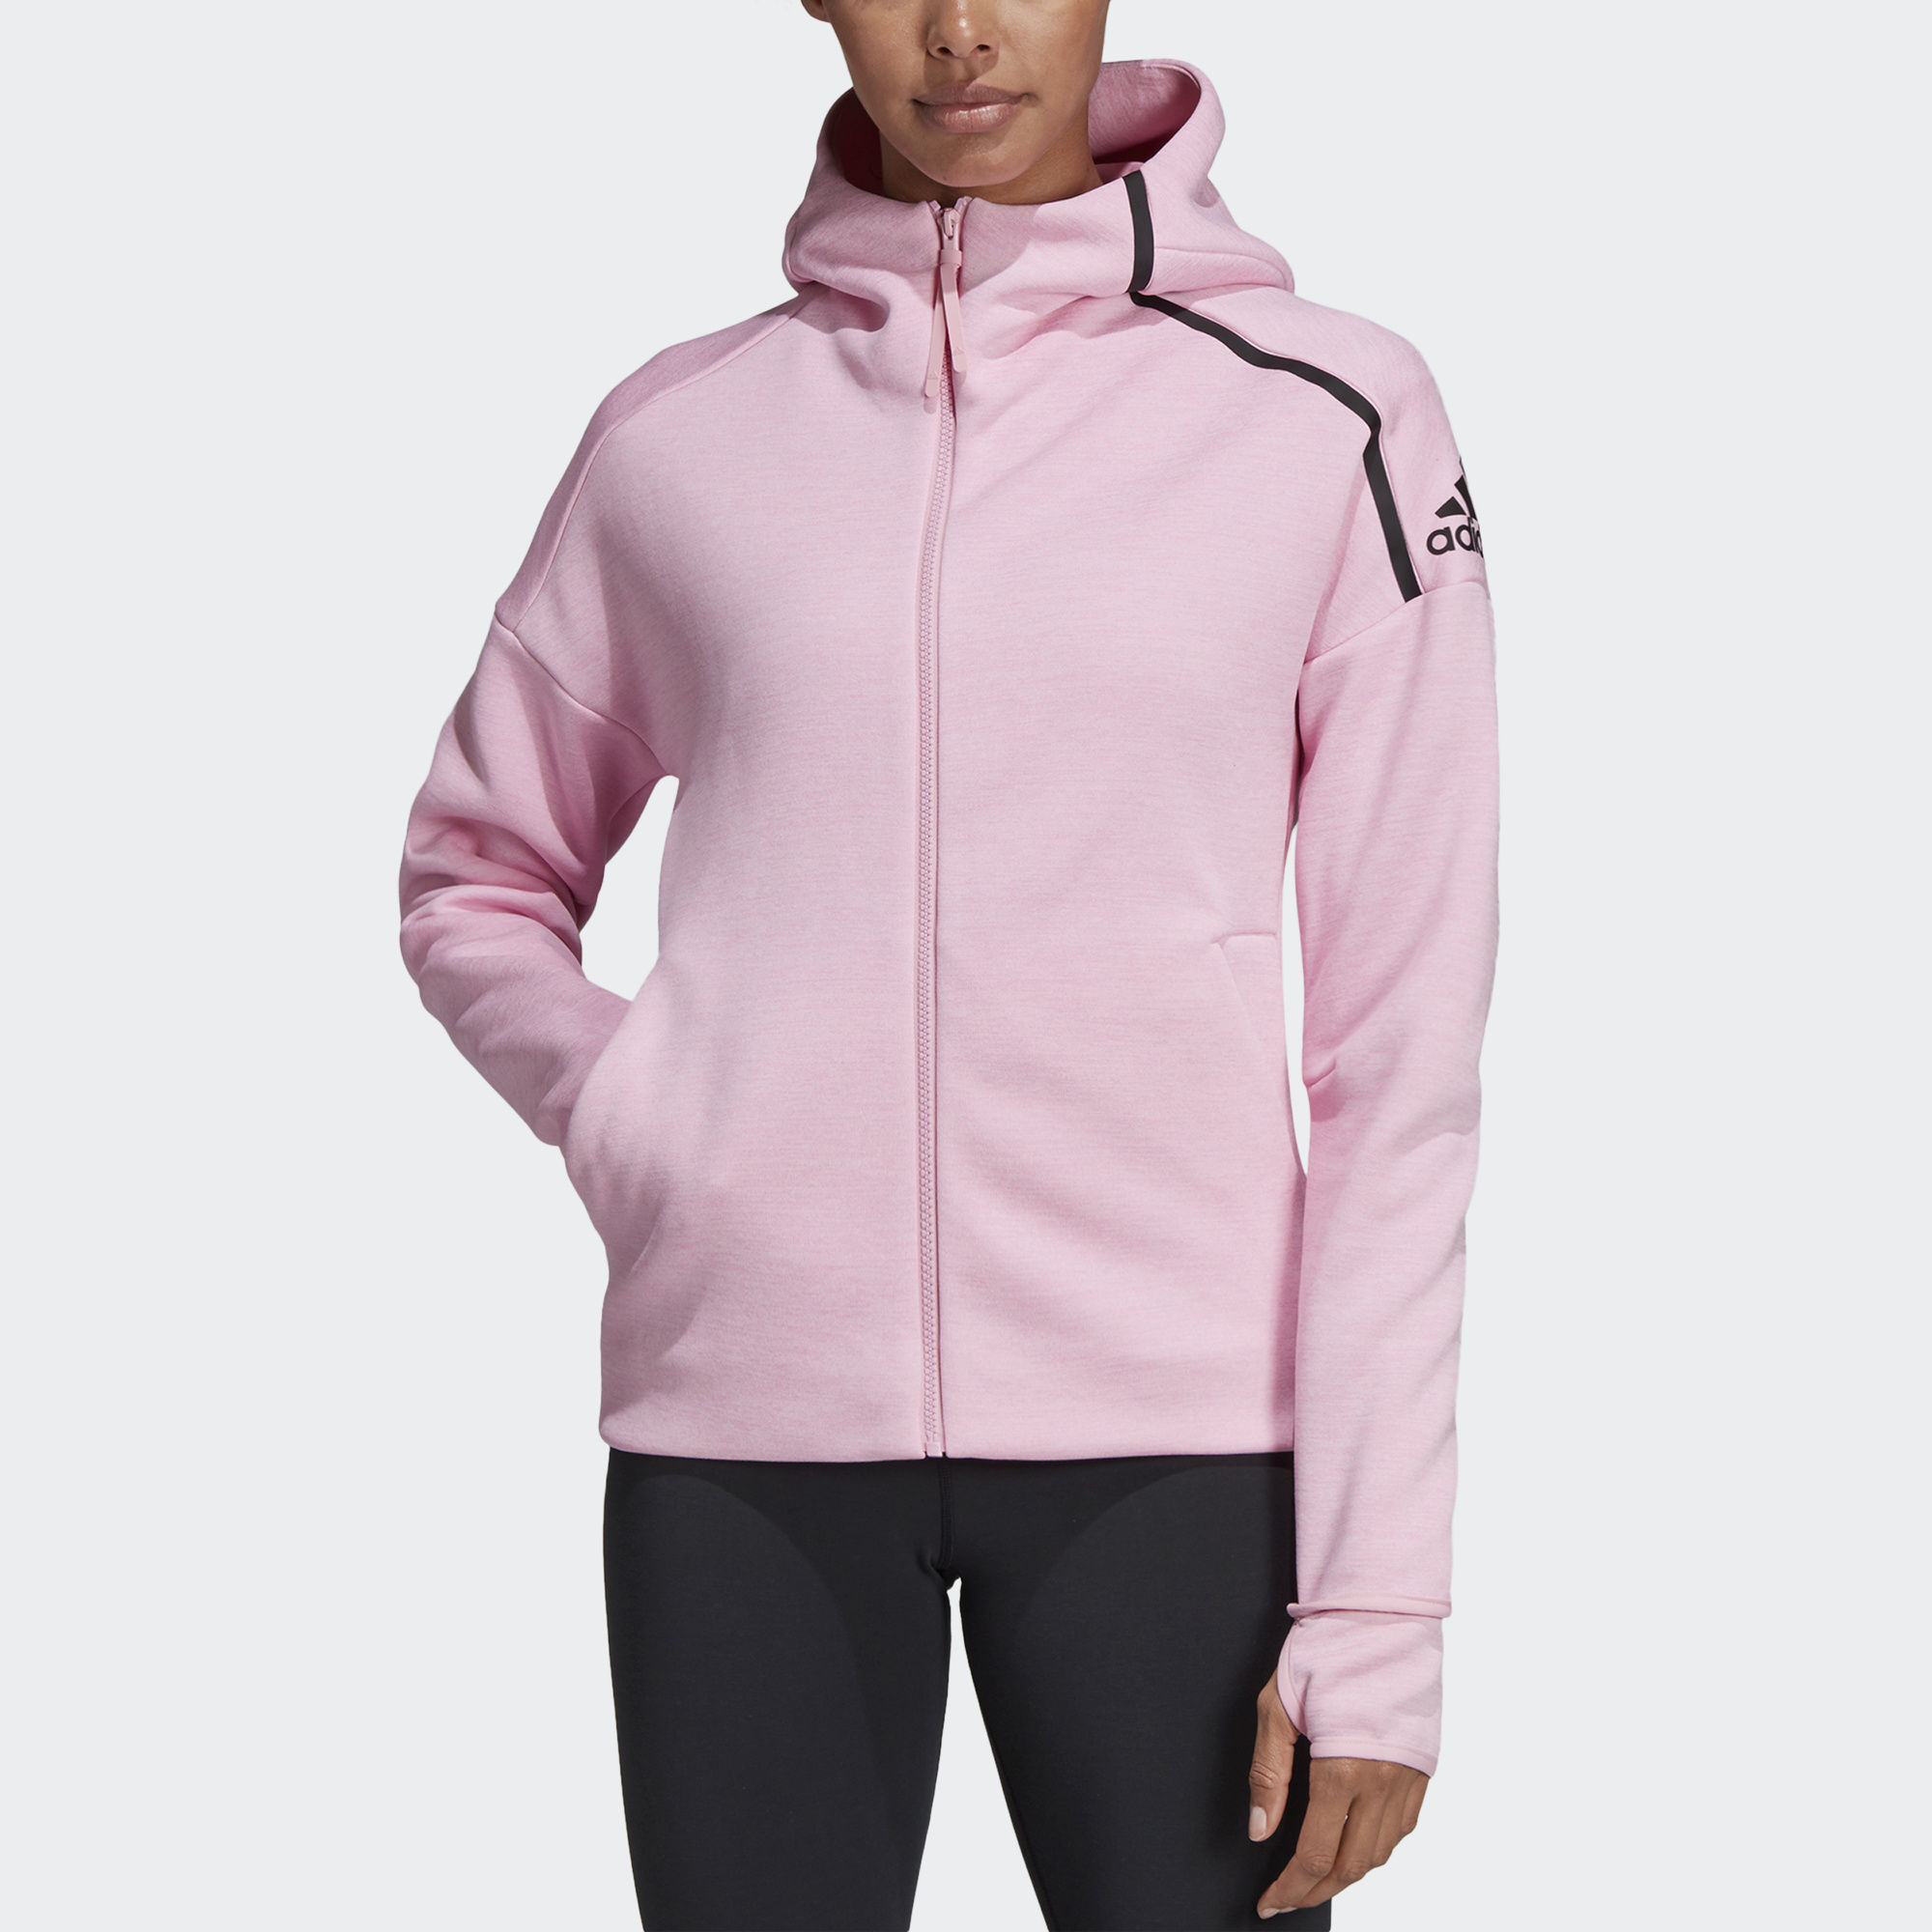 Adidas Z.n.e. Fast Release Hoodie | Upp till 70% |